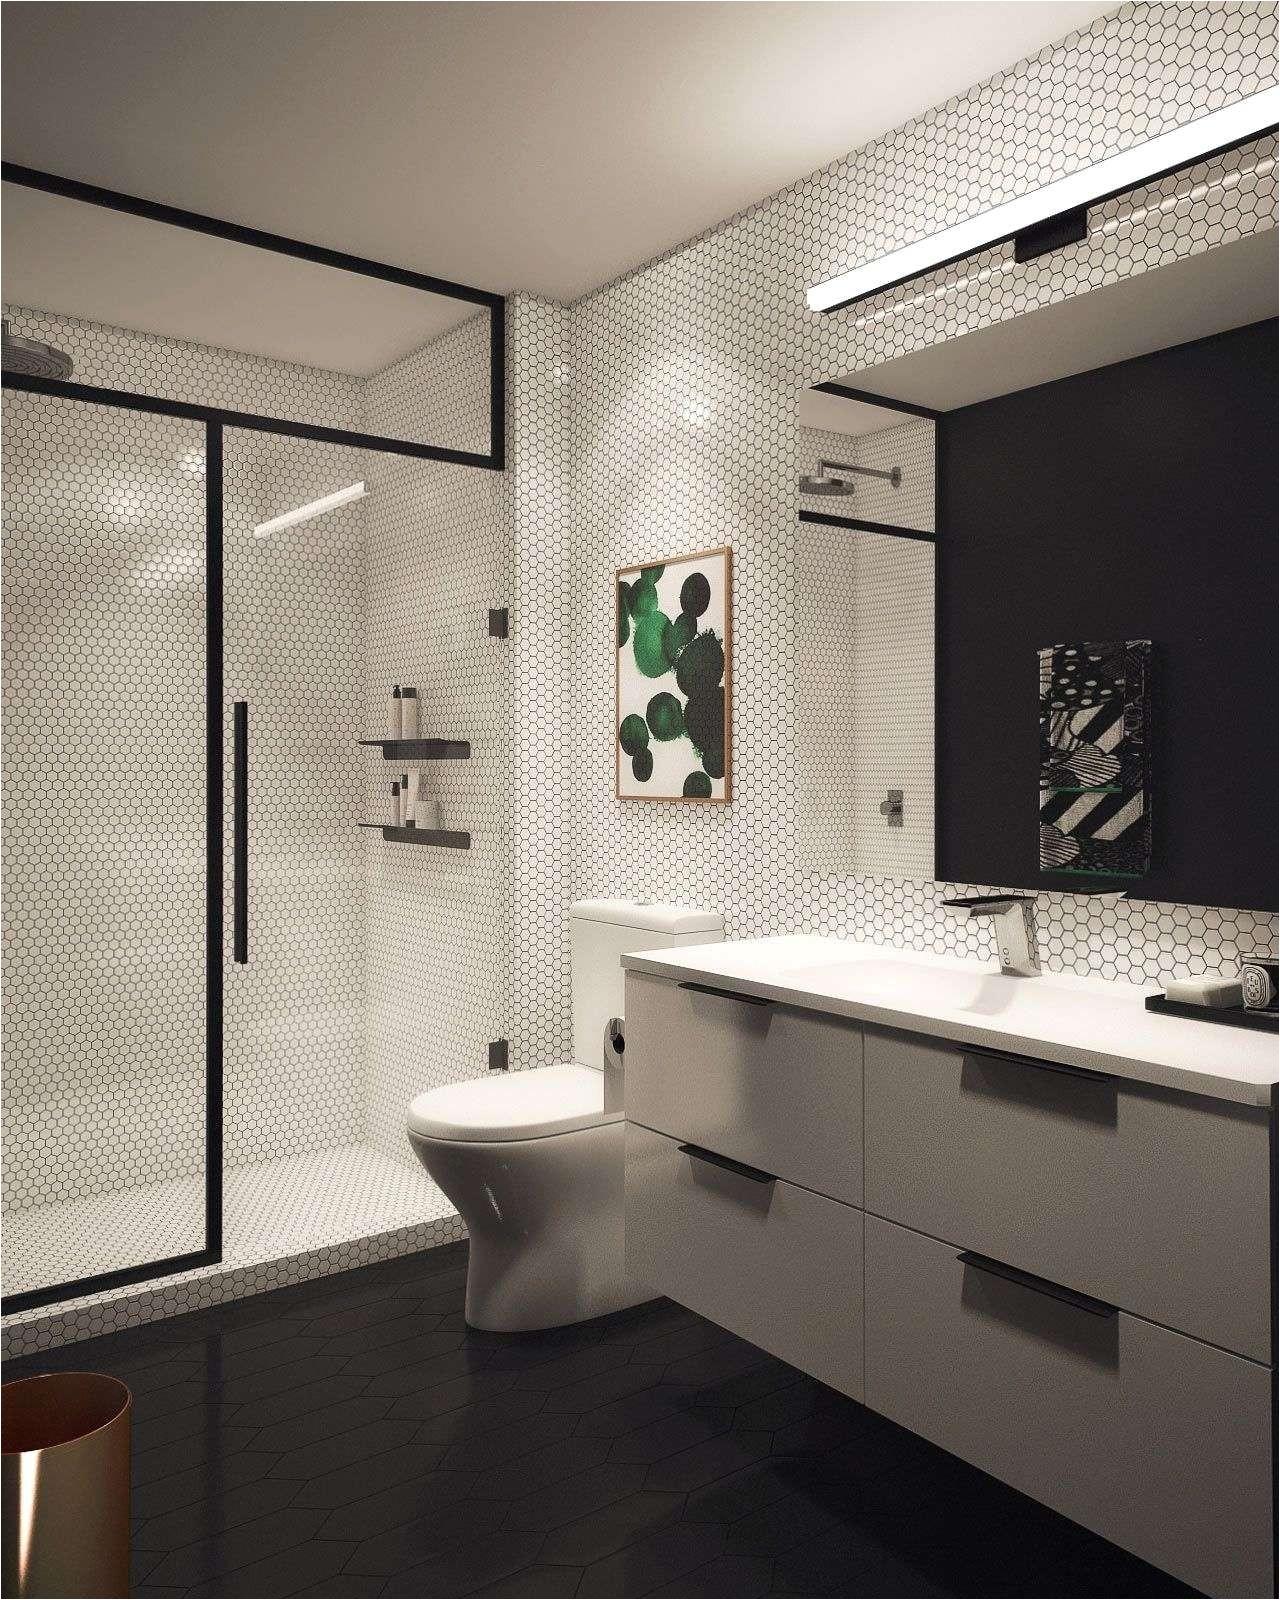 Design Ideas for the Bathroom Bathroom Design Ideas for Small Bathrooms Valid Lovely Small